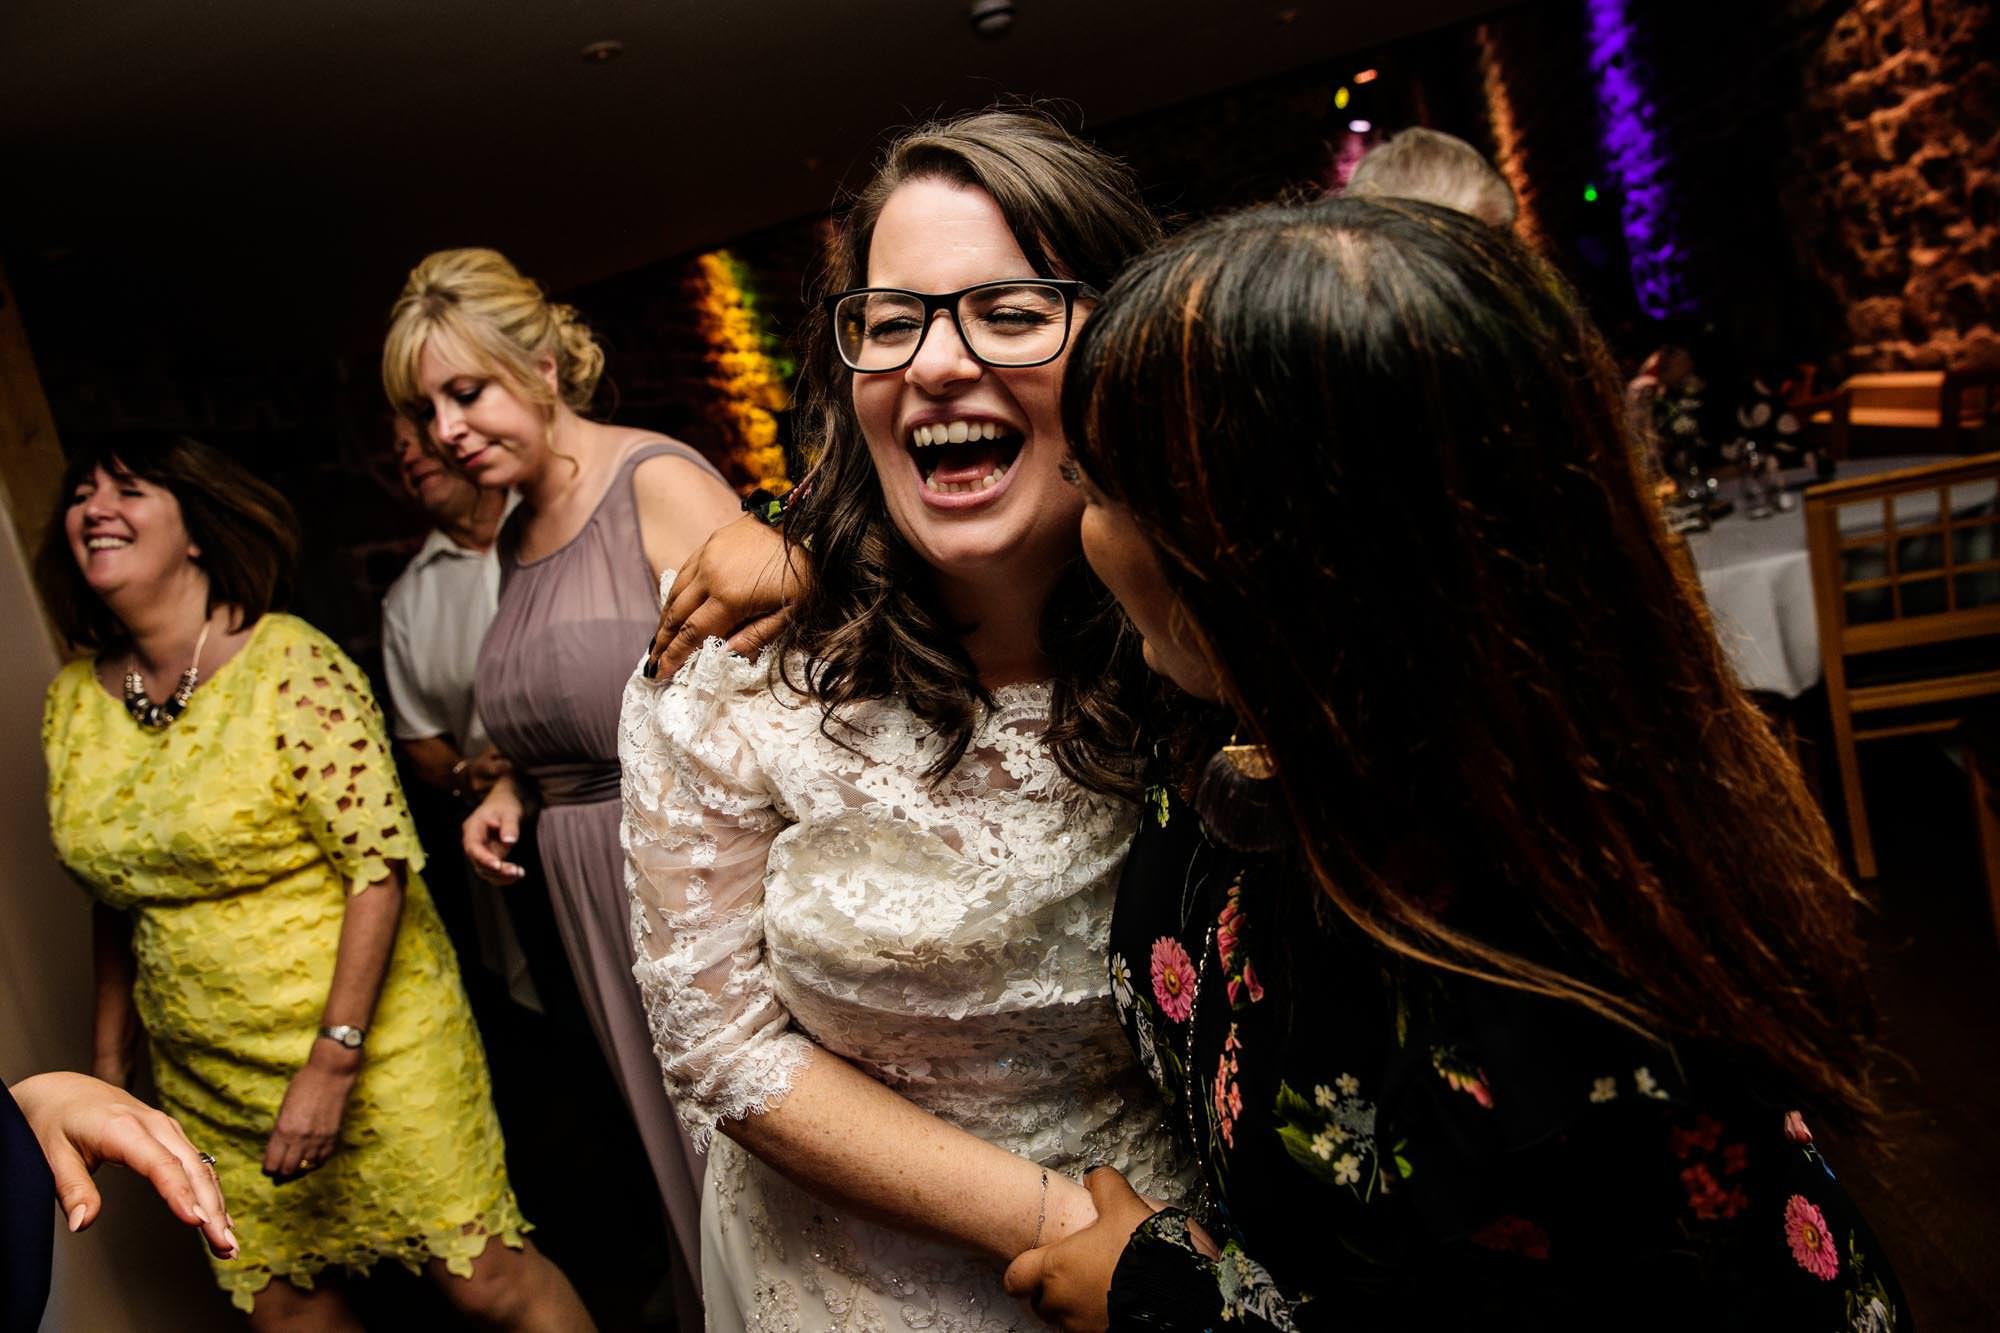 Ashes Barns Fun Wedding Photographs